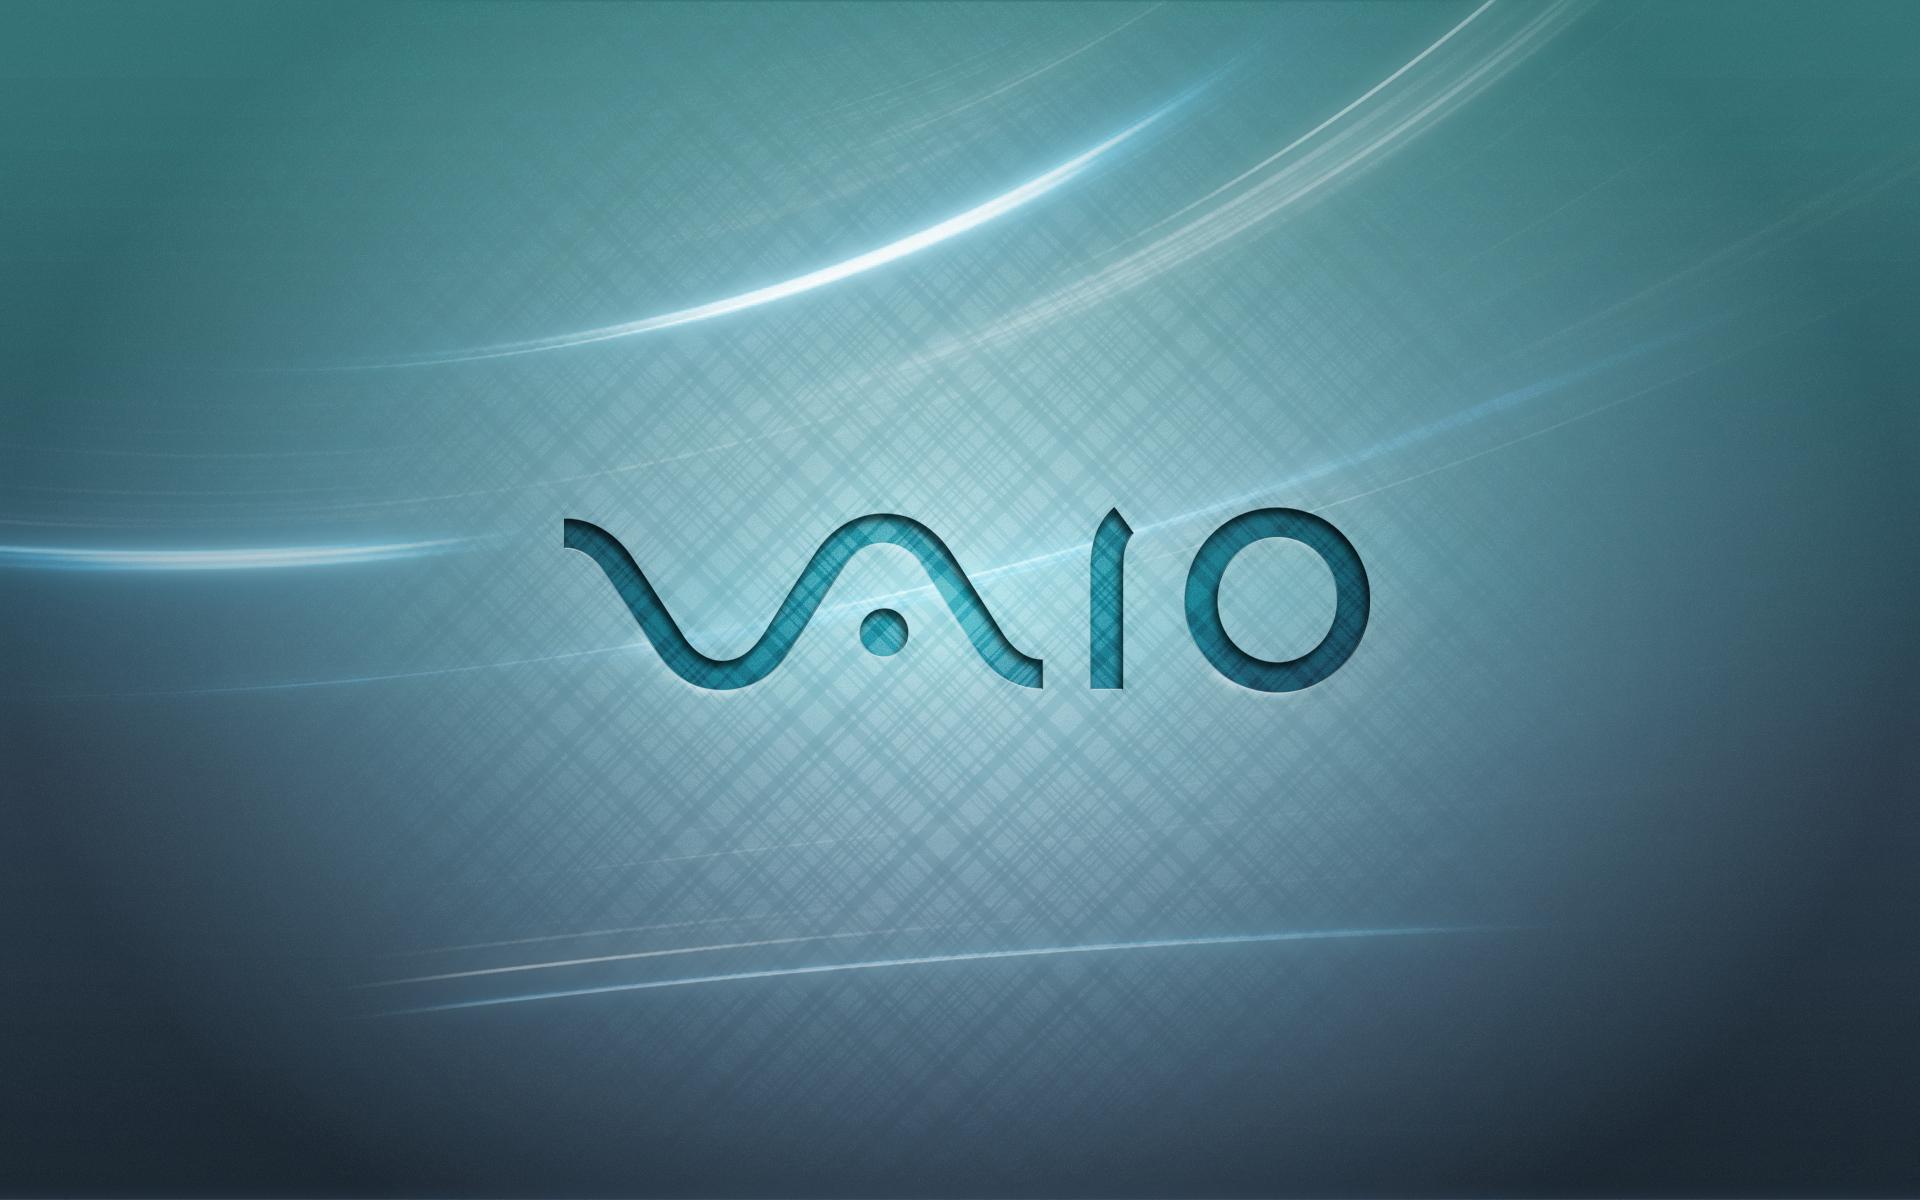 VAIO Wallpaper 1920x1080